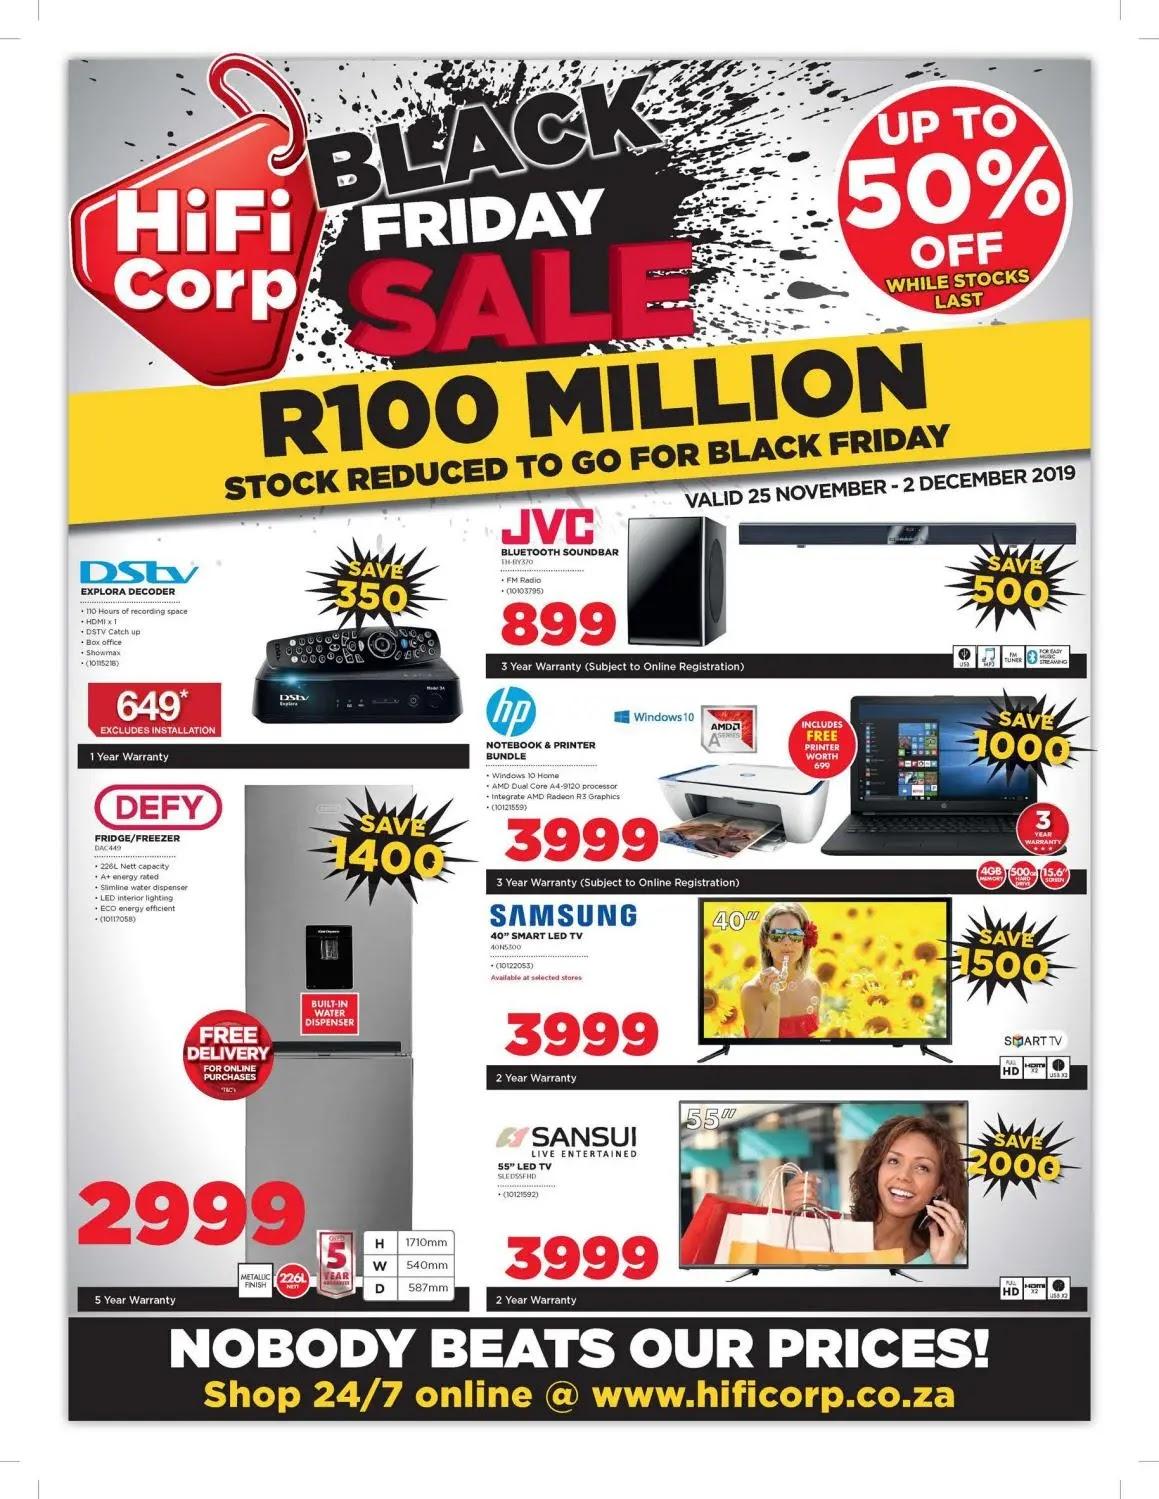 HiFi Corporation Black Friday Deals  Page 1